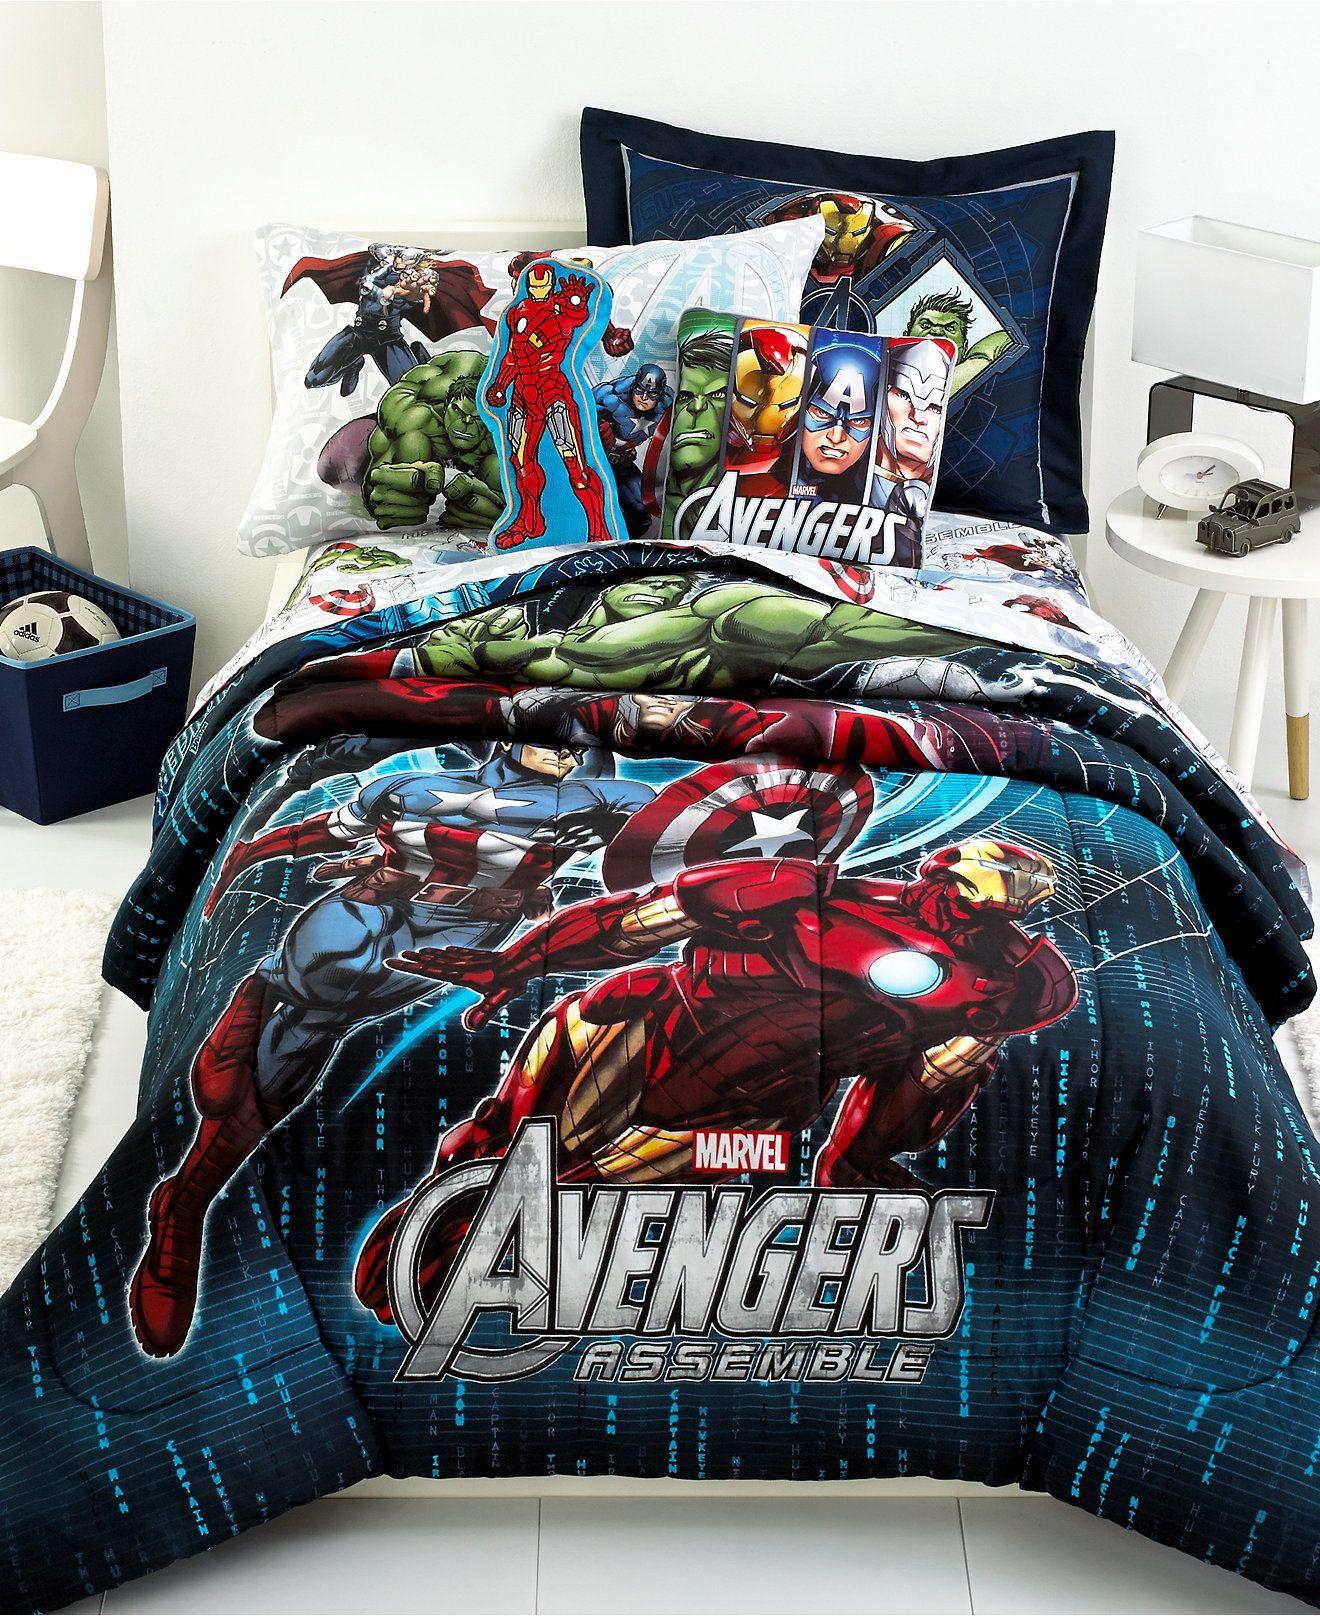 jay franco picture of avengers set decoration sets comforter